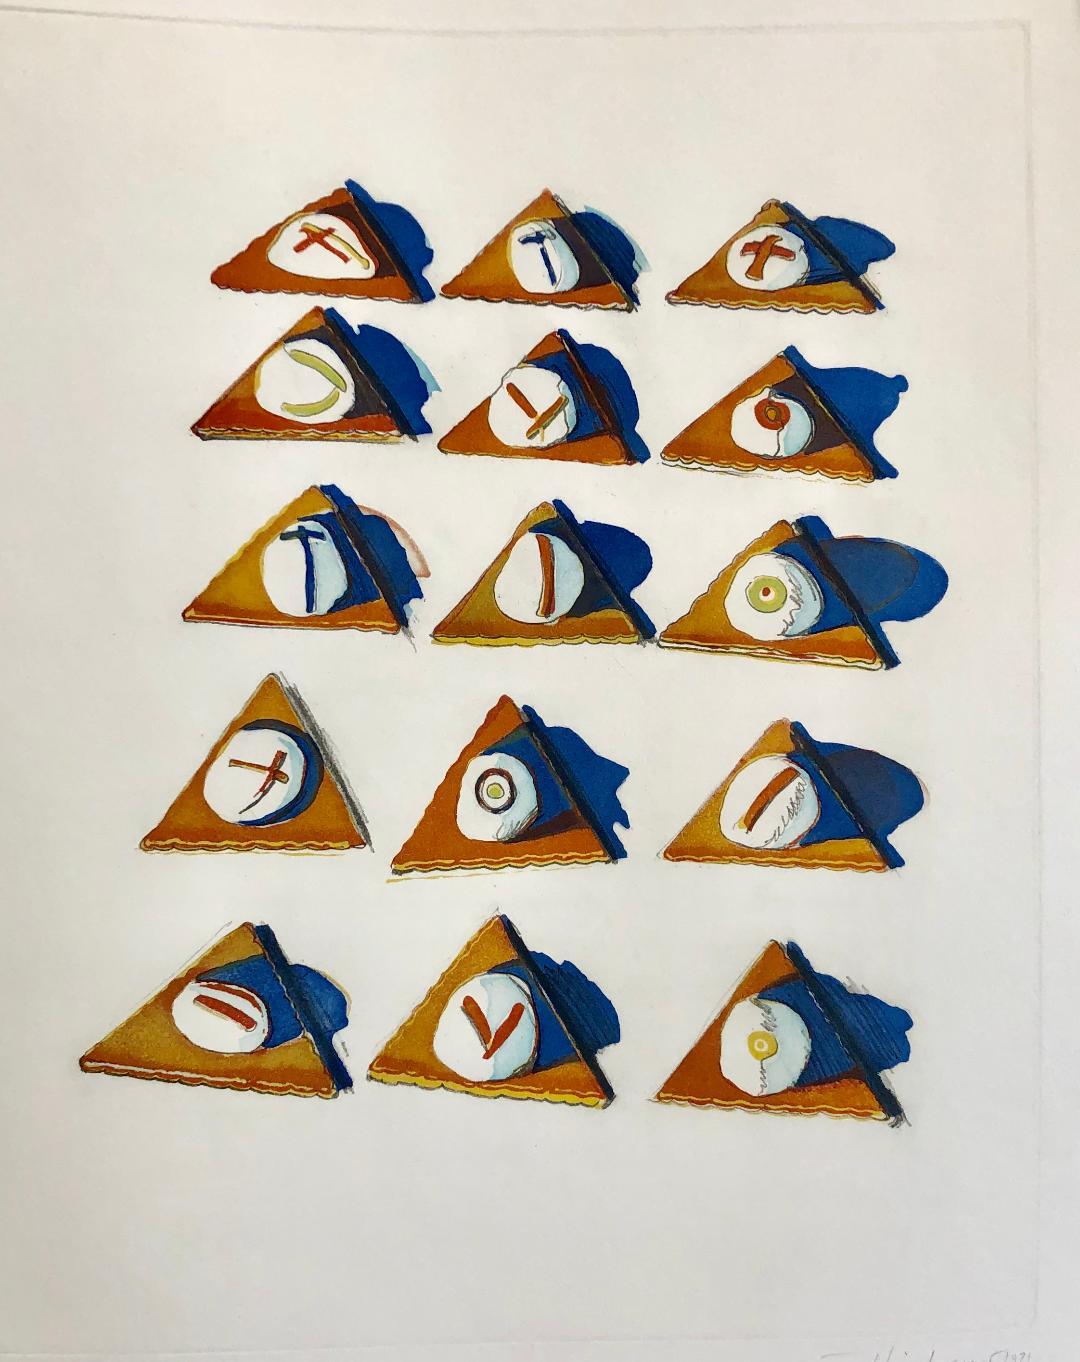 Wayne Thiebaud. Triangle Thins, 1971.